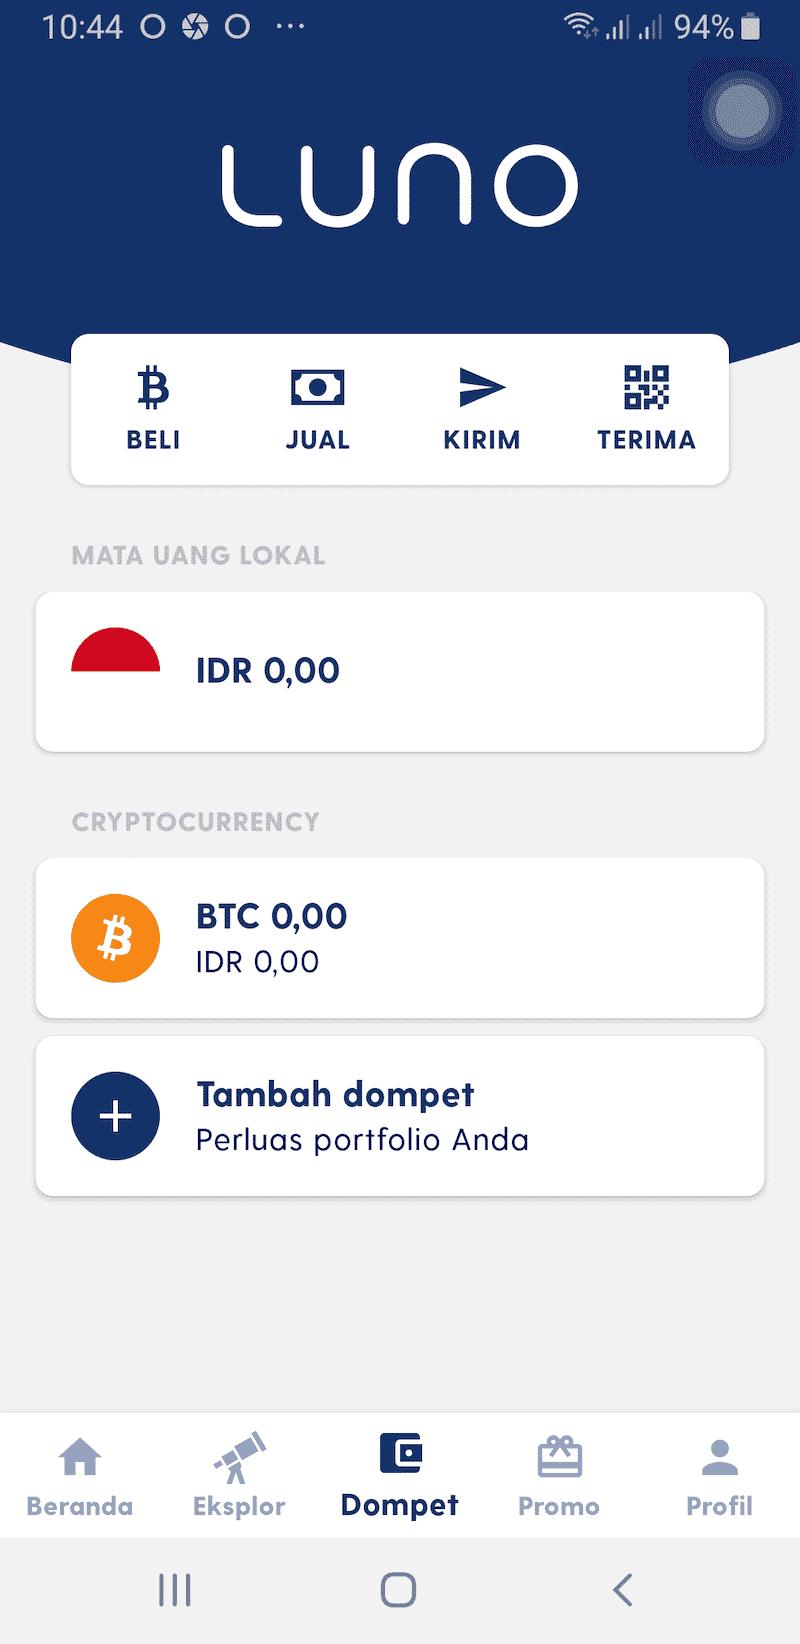 Fitur Aplikasi Luno Jual Beli Bitcoin Kripto